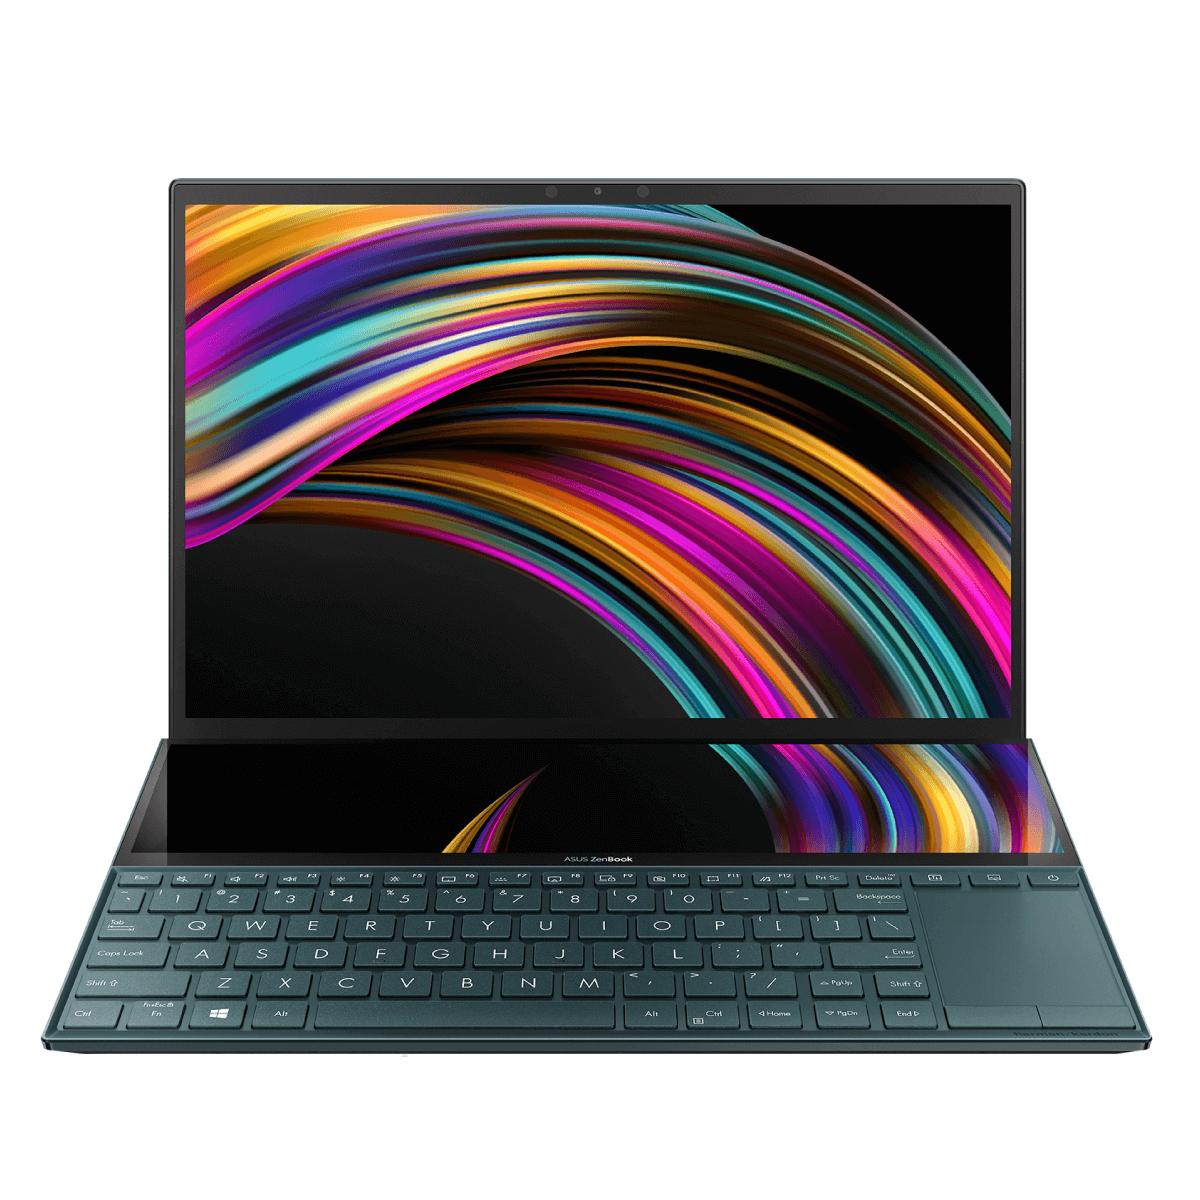 ASUS ZenBook Duo (i7, Celestial Blue)